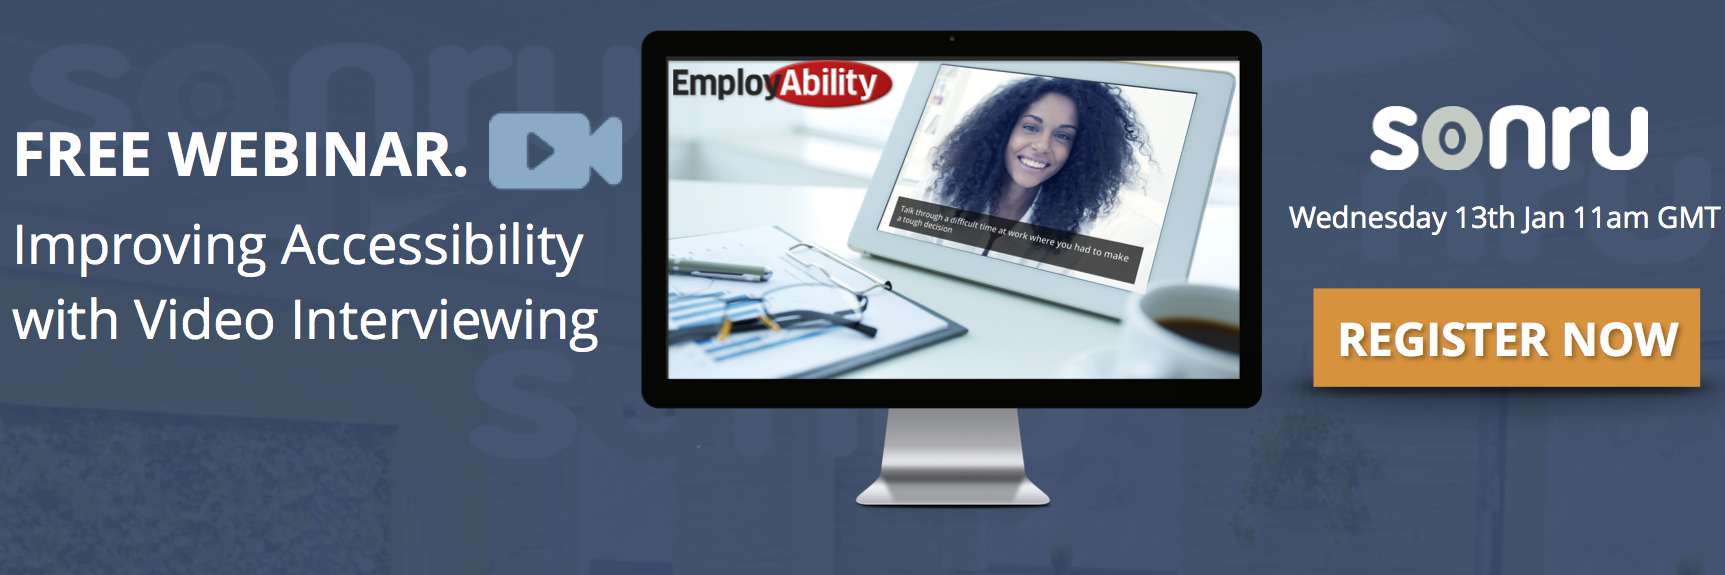 Employability_Webinar_copy_2.png